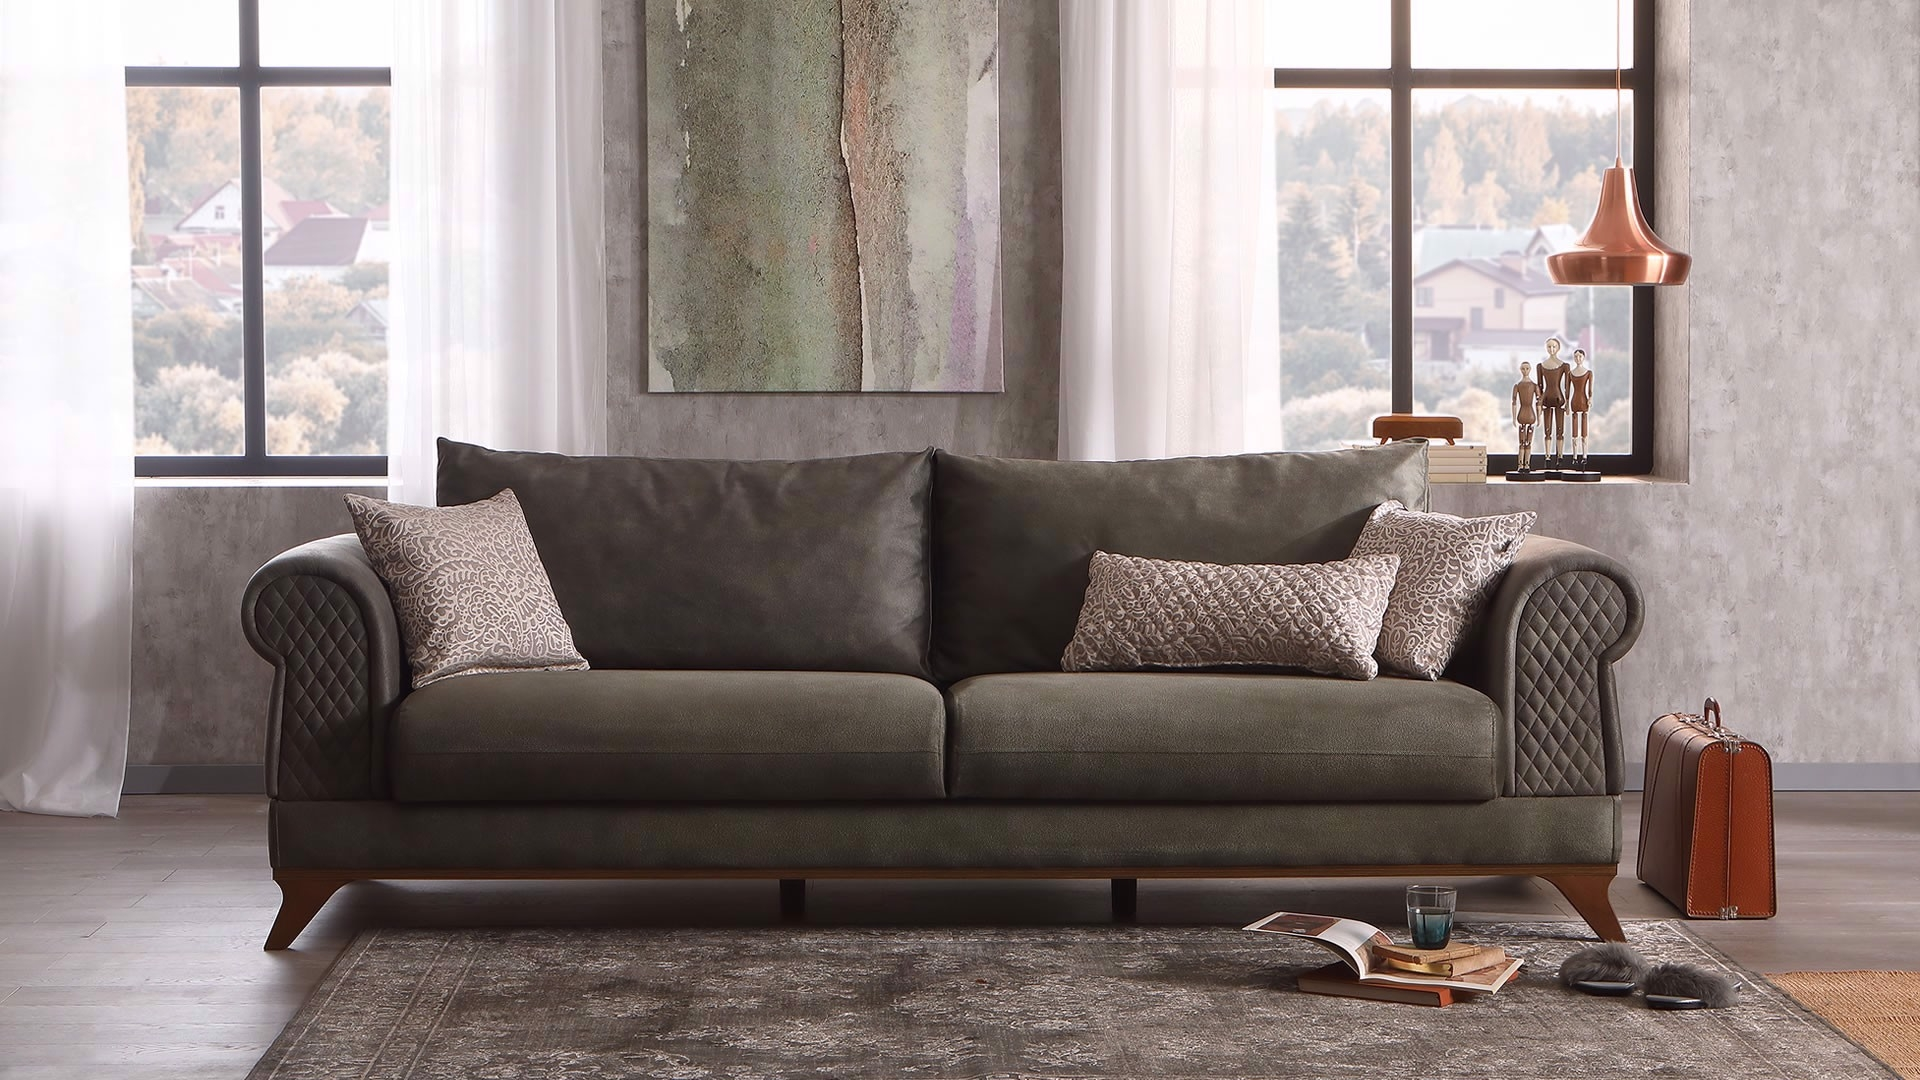 Canapea extensibila cu lada de depozitare, tapitata cu stofa, 3 locuri Raveno Verde Olive, l246xA100xH81 cm imagine